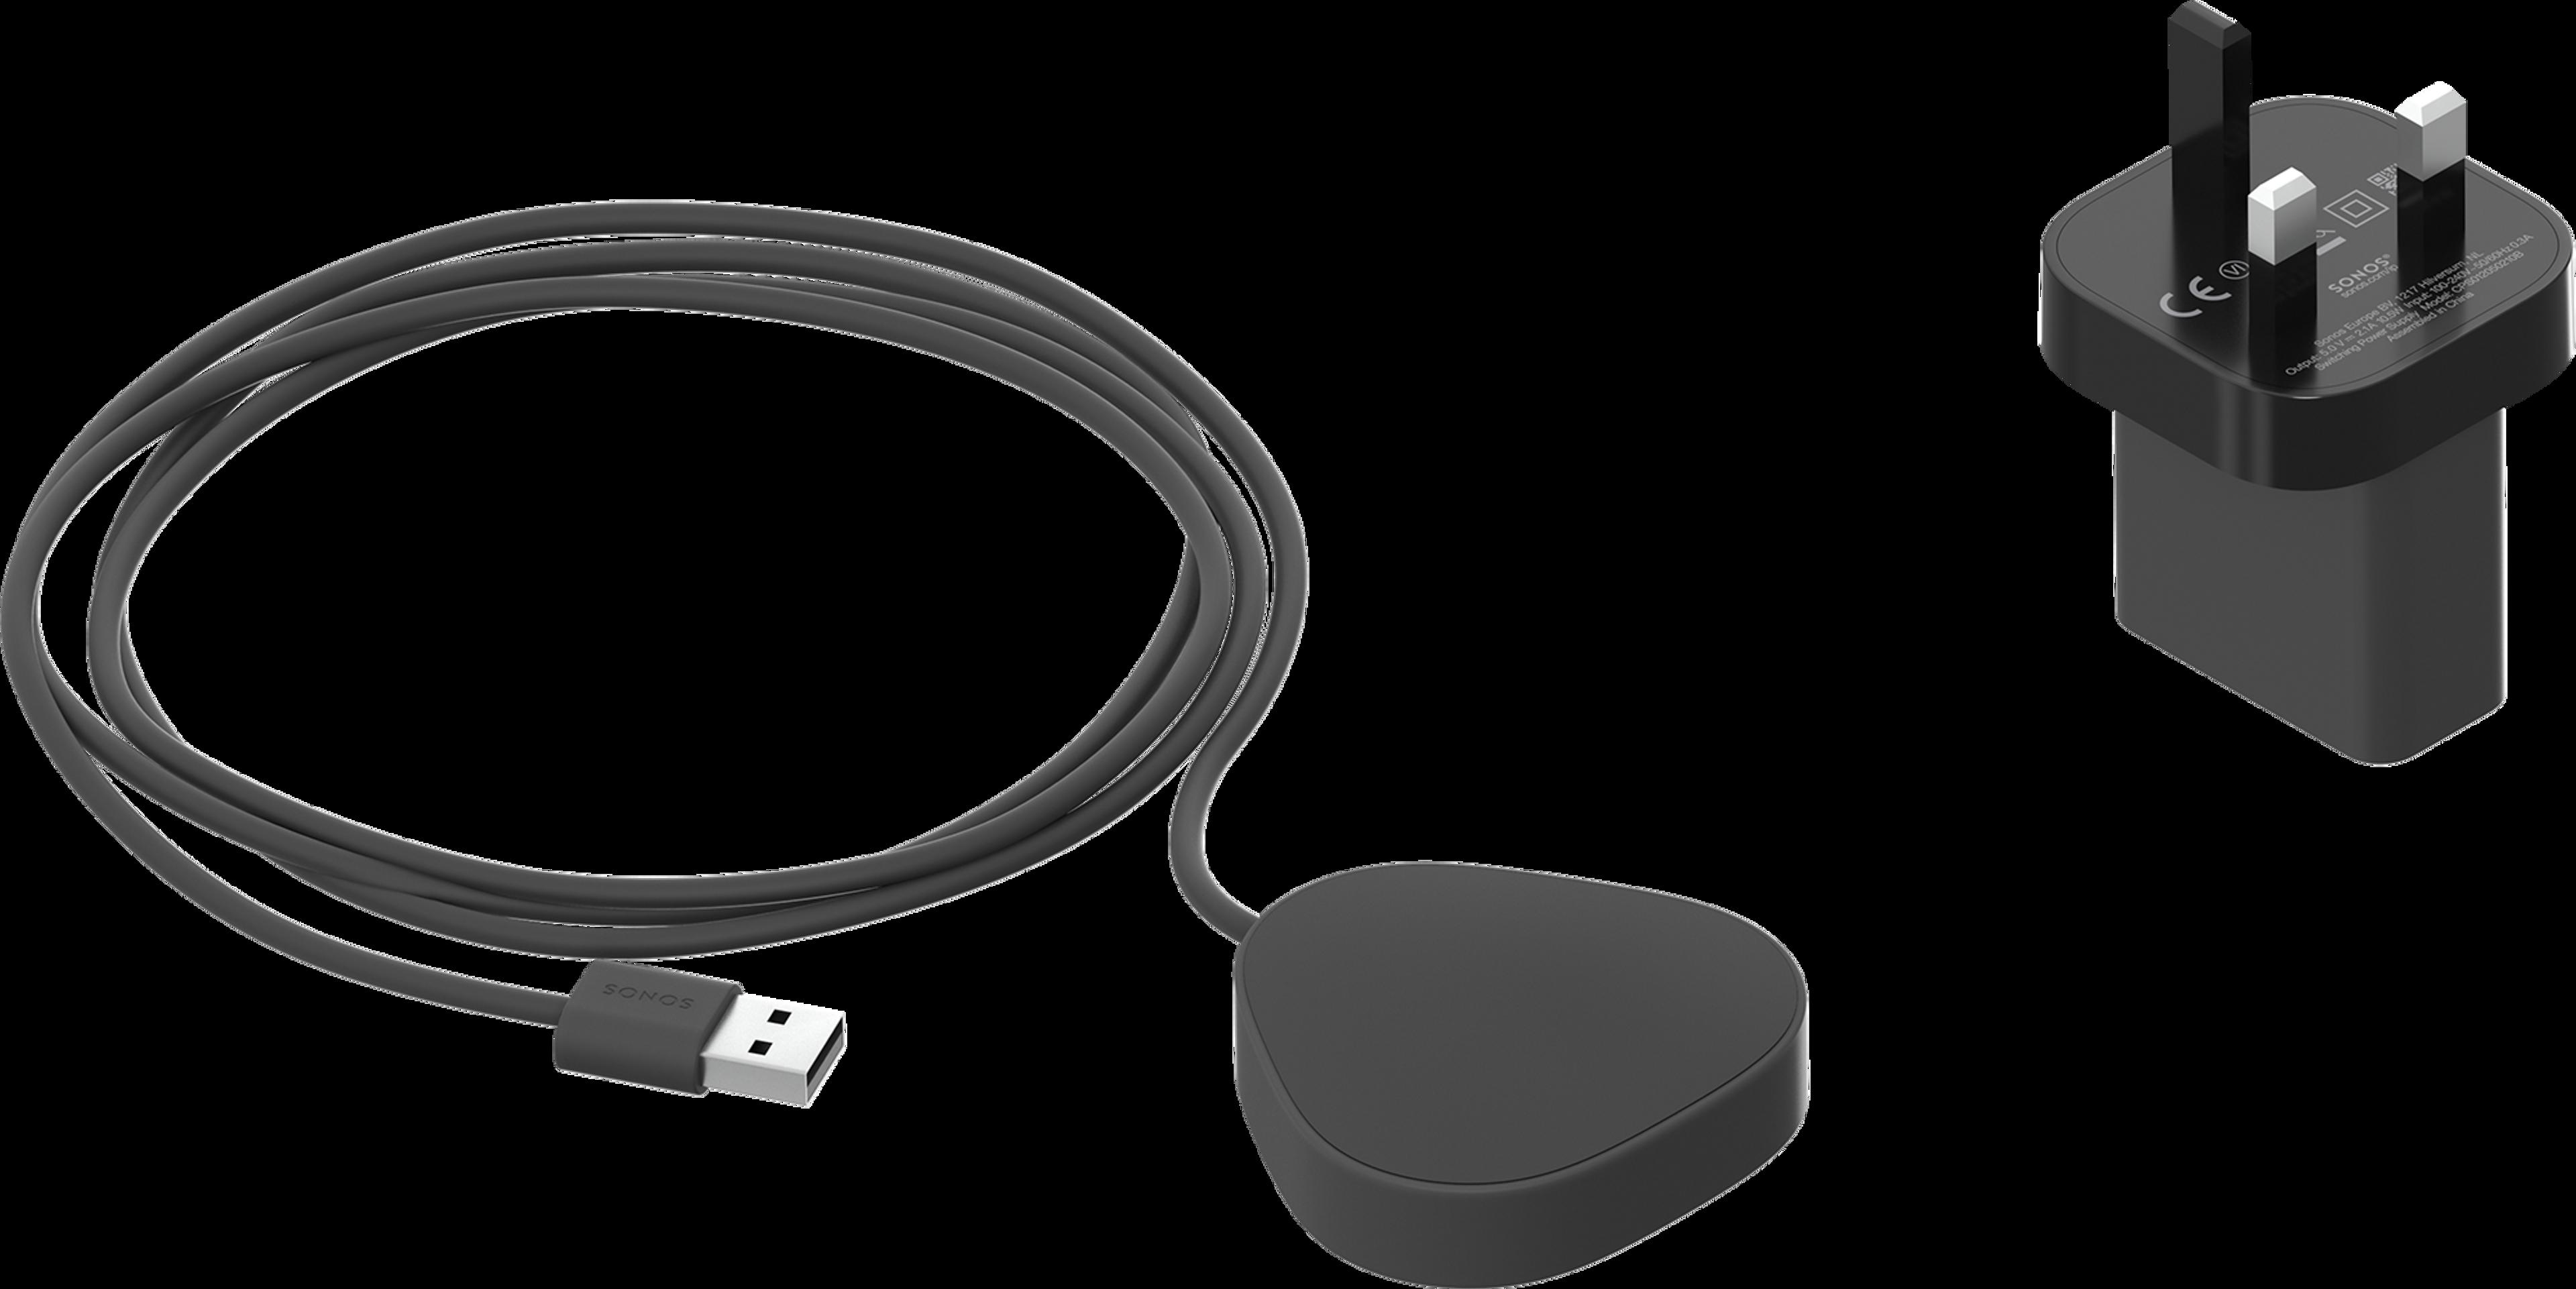 Roam wireless charger shadow black